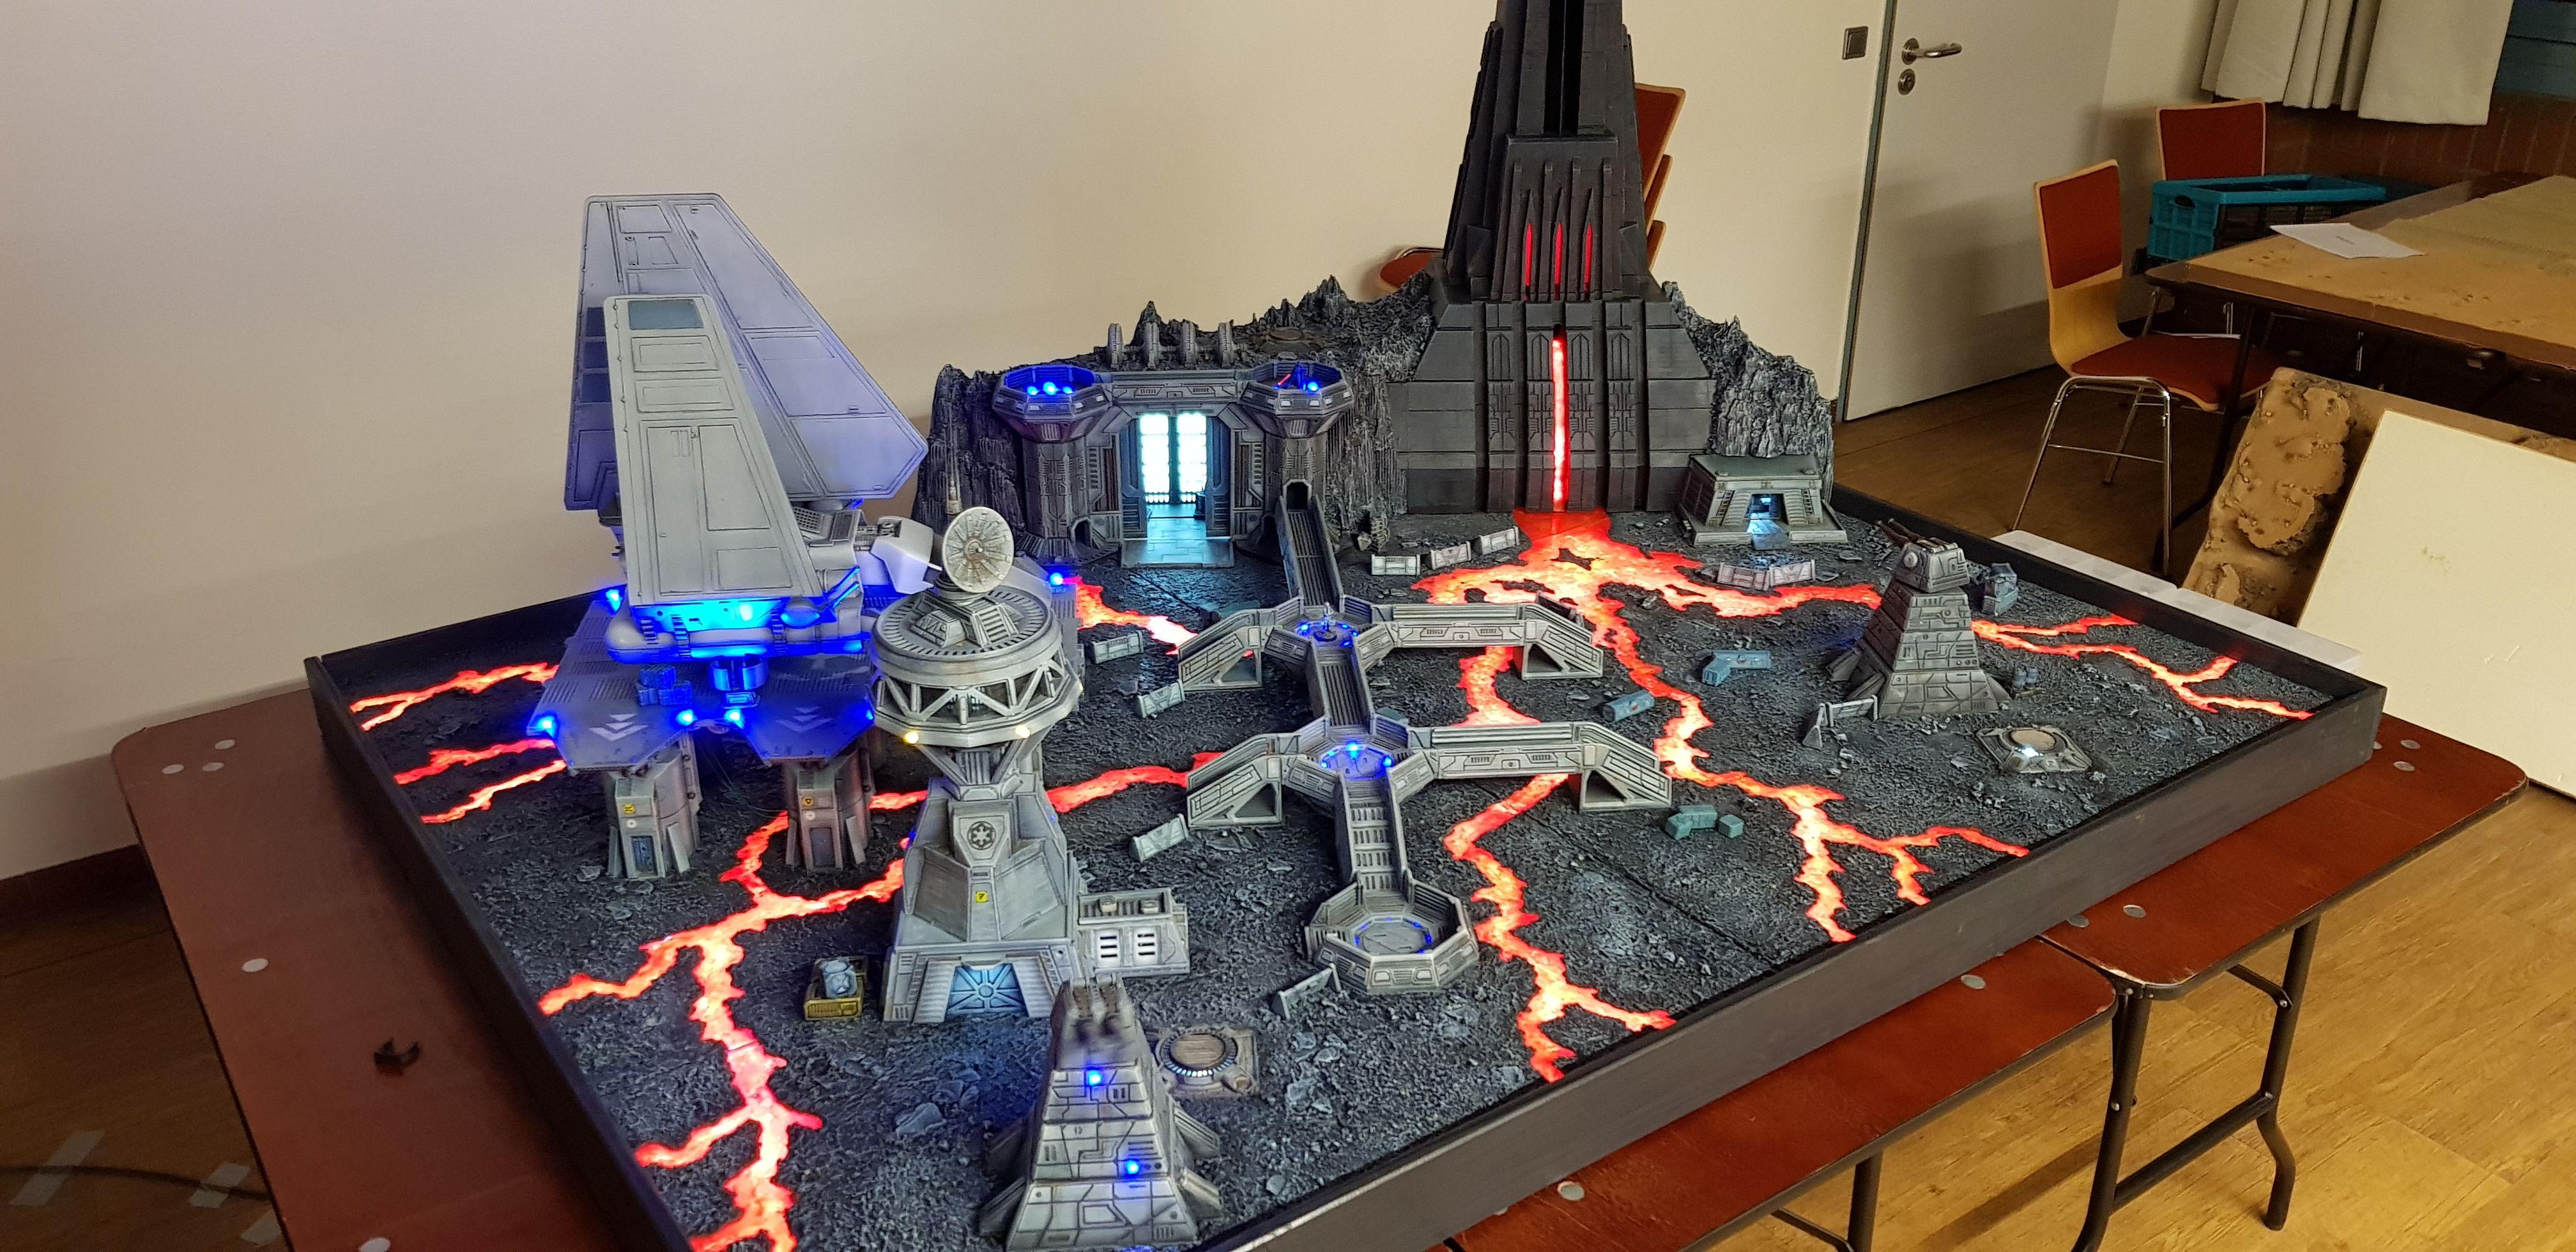 Star Wars Legion Mustafar Table Star Wars Hoth Star Wars Toys Star Wars Action Figures Display